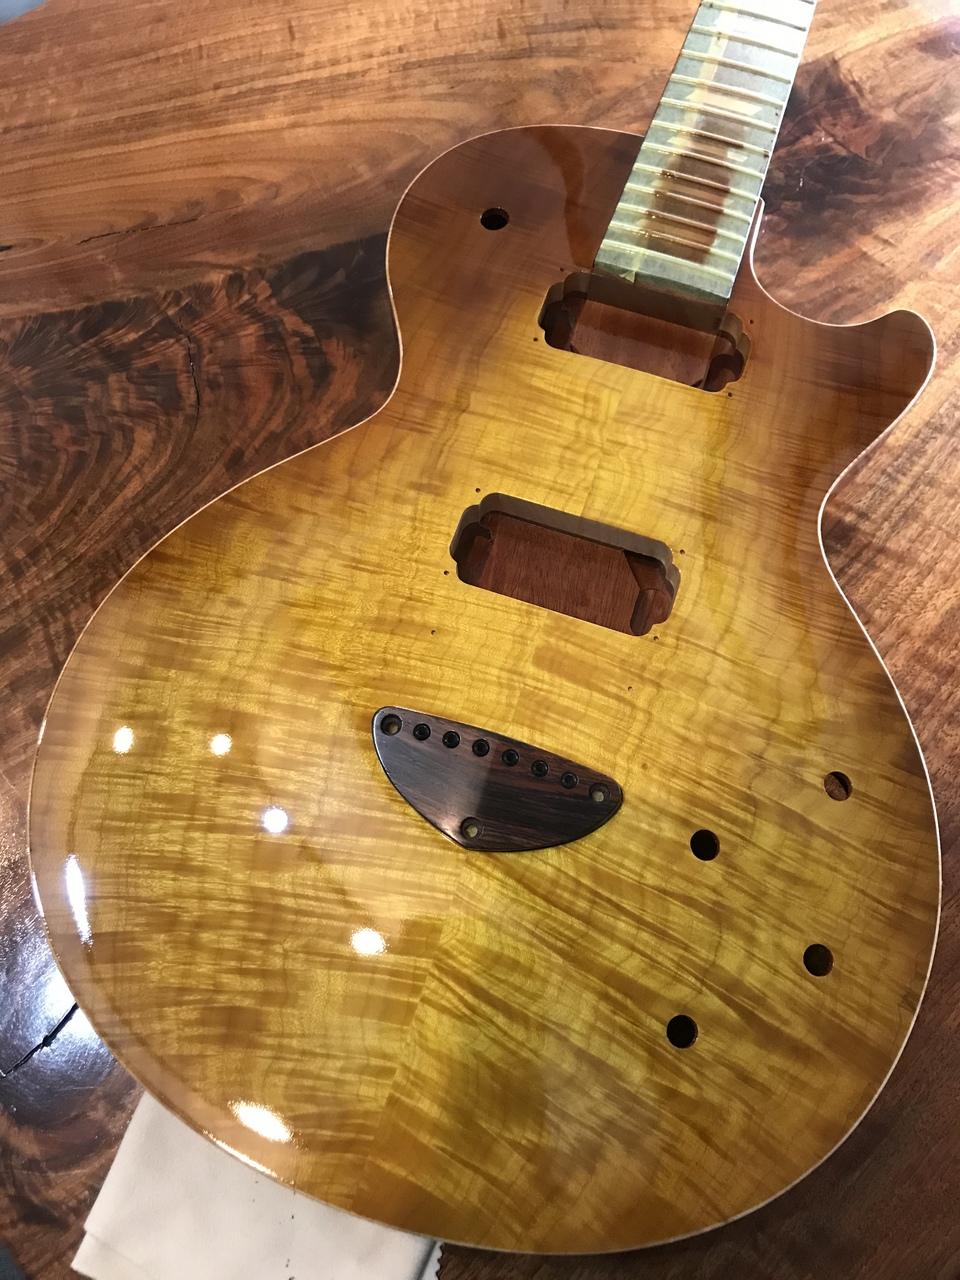 Bizen Custom Order Grain Arched Top Hard Rock Maple Top Jacaranda FB 1-Piece Cuban Mahogany Neck